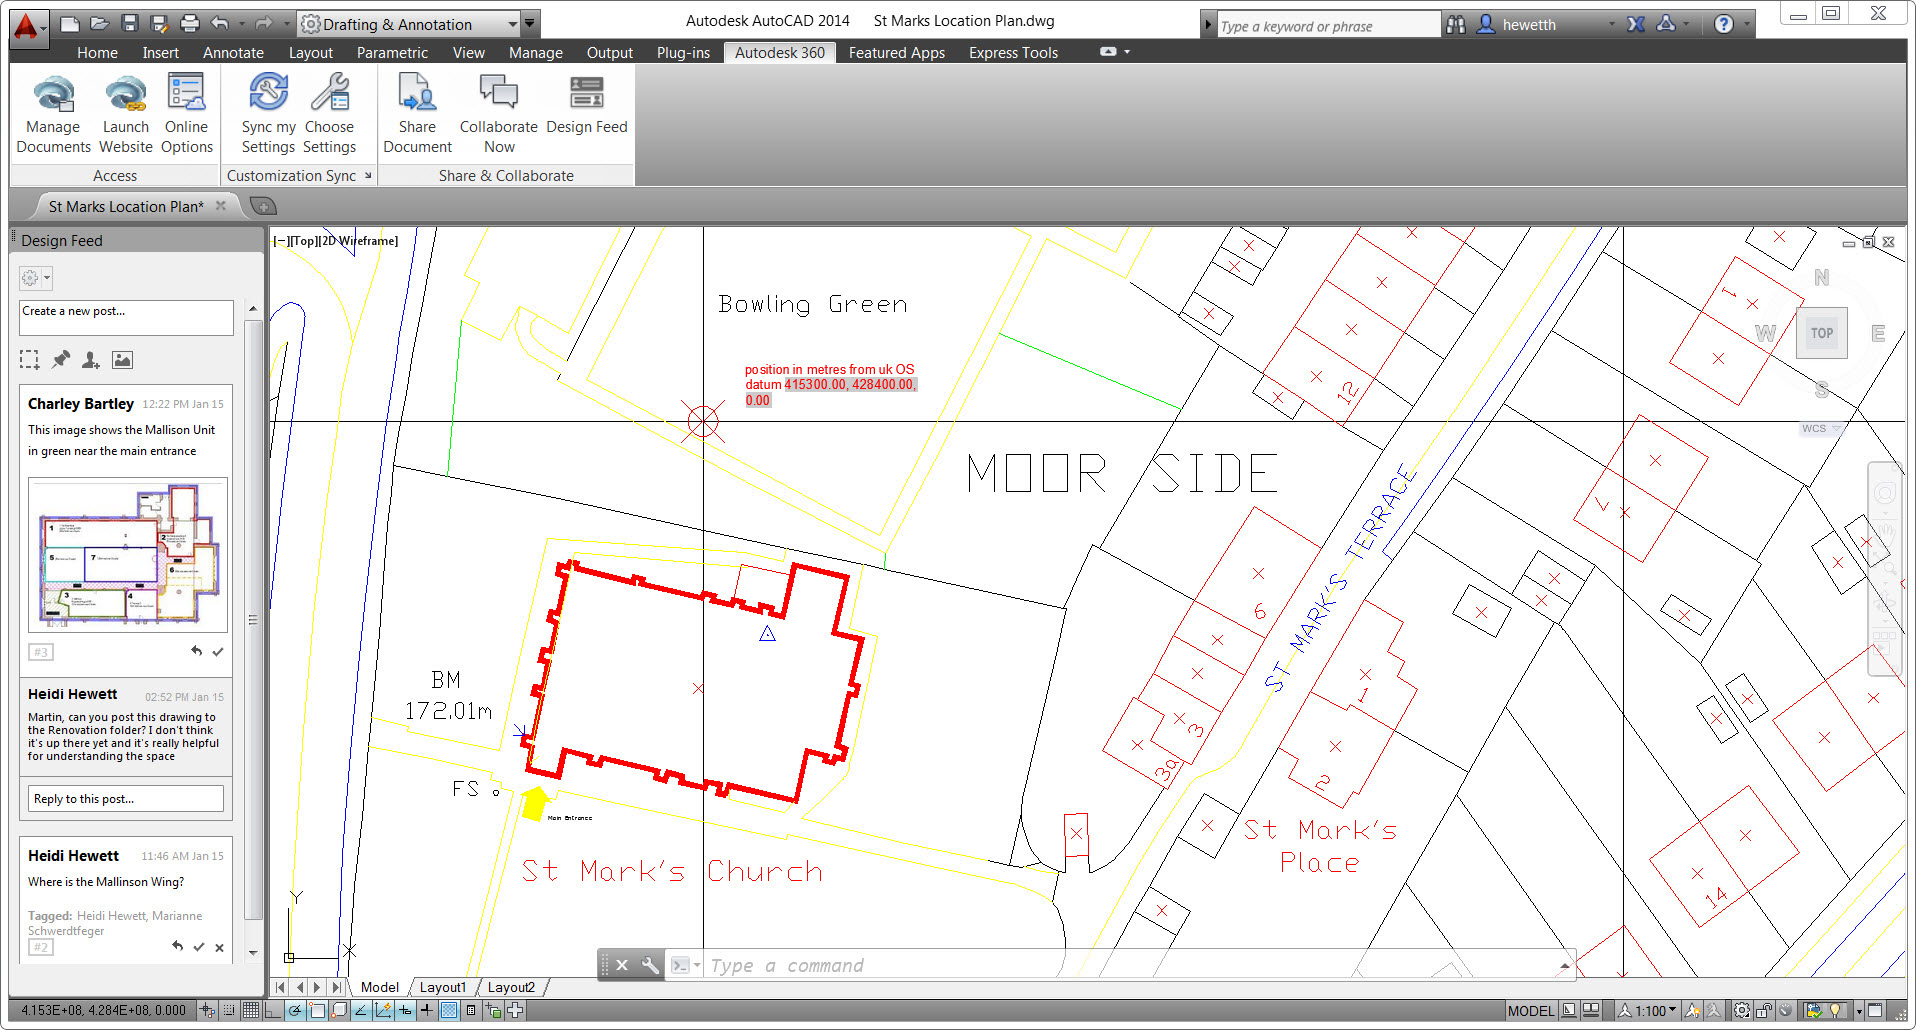 Software proiectare generala - Autodesk AutoCAD AUTODESK - Poza 3